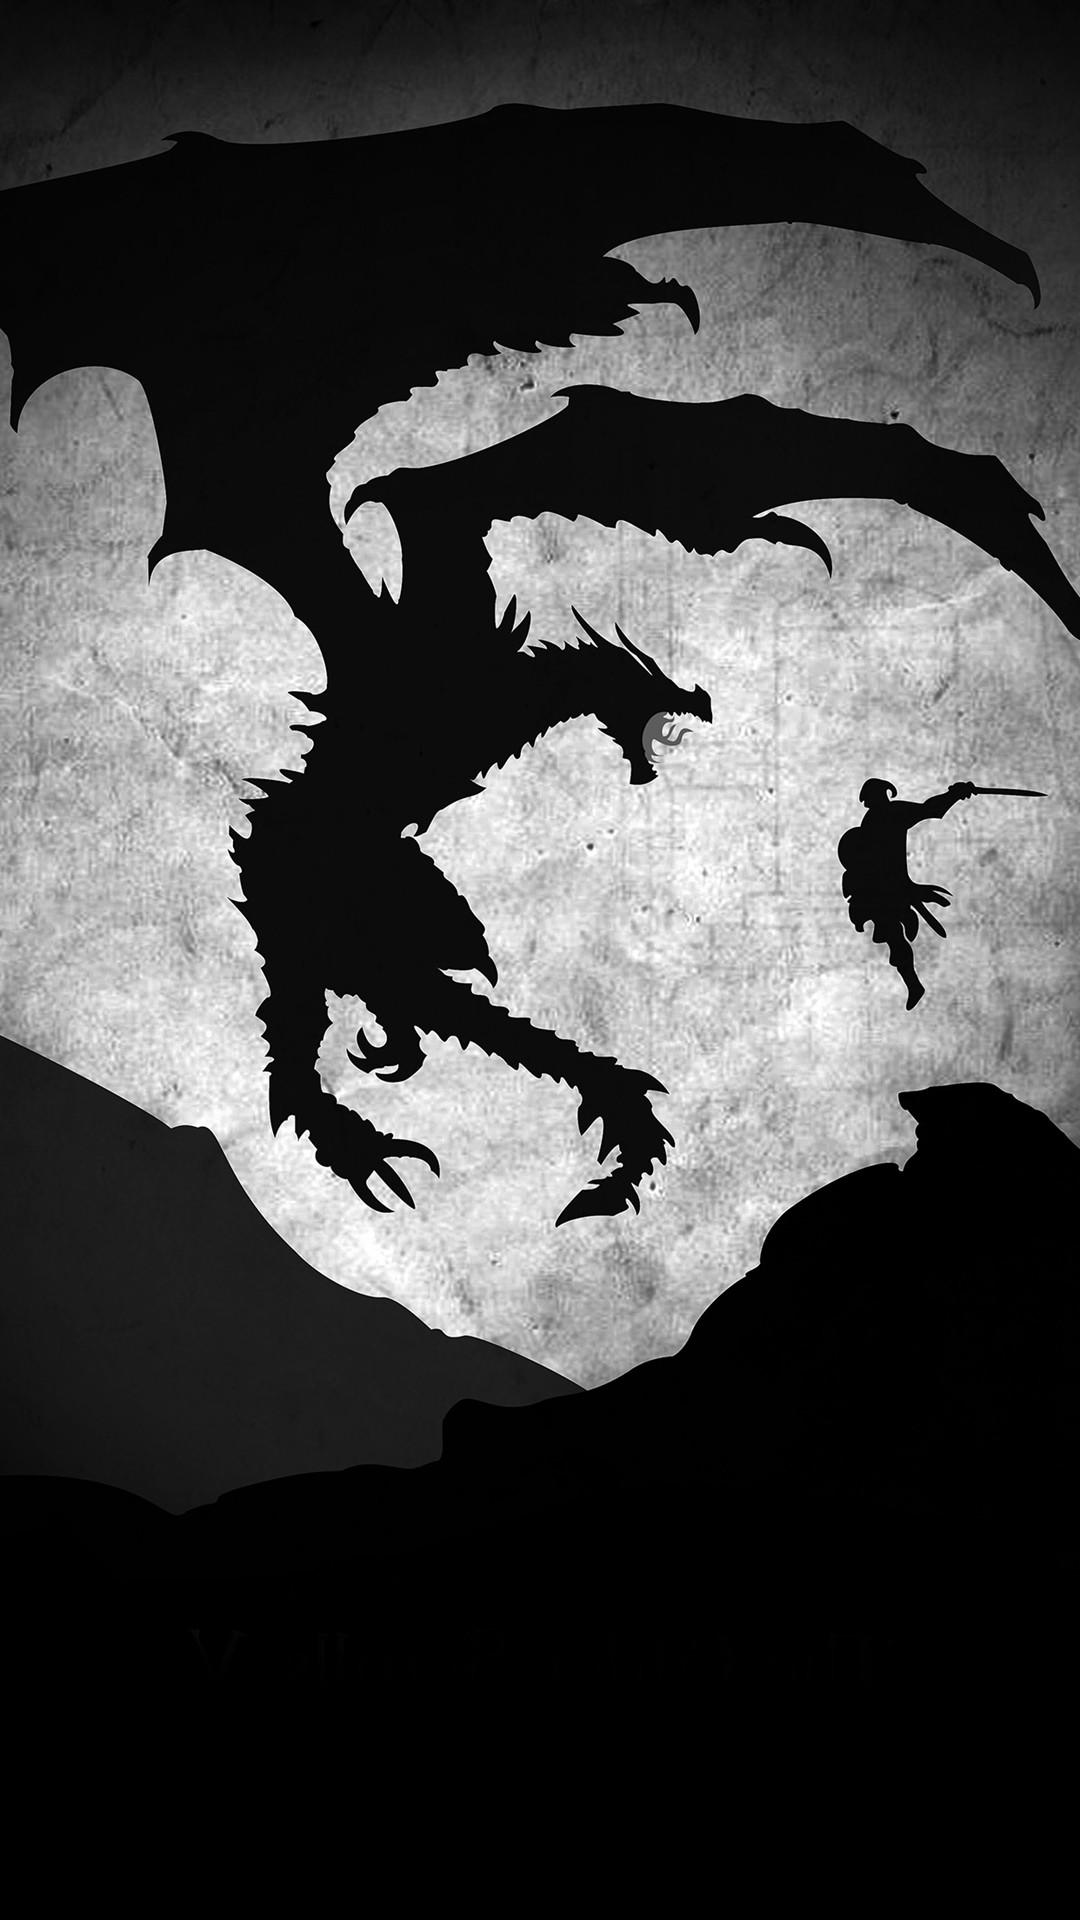 Skyrim Dragon Illustration Art Bw #iPhone #6 #wallpaper